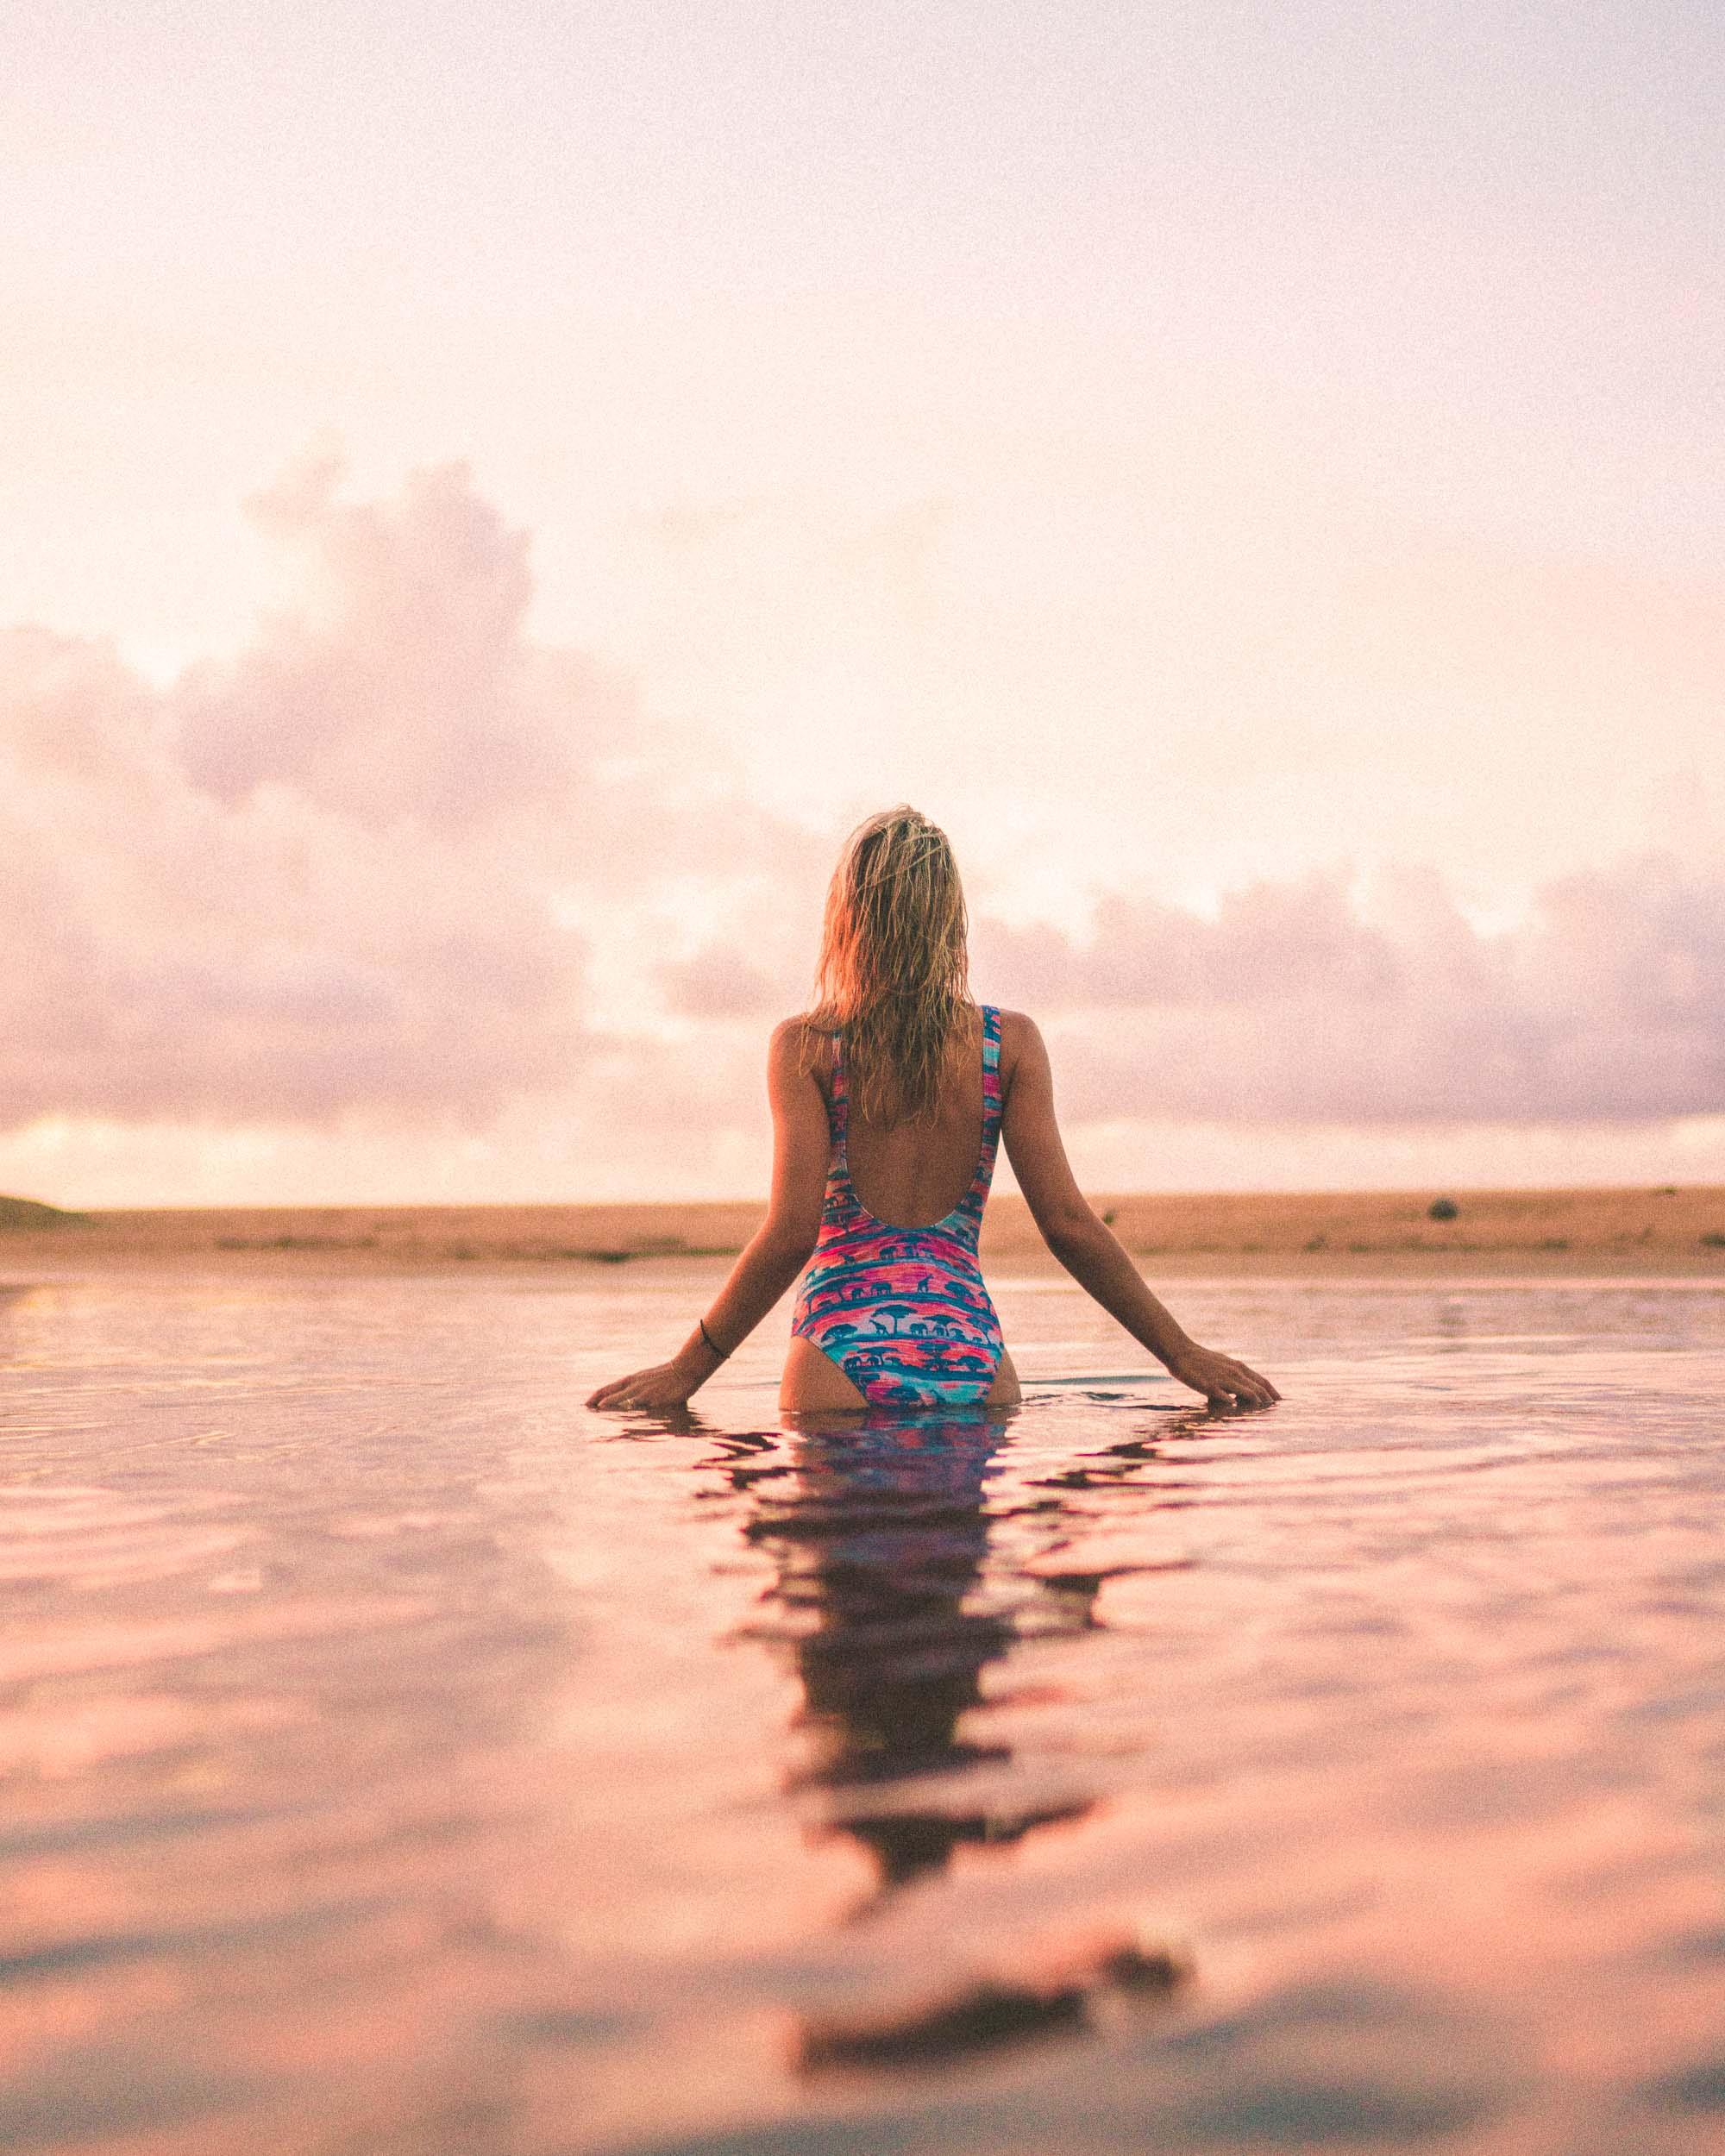 Hanalei Bay Beach Sunset Hawaii Kauai Travel Guide via Find Us Lost